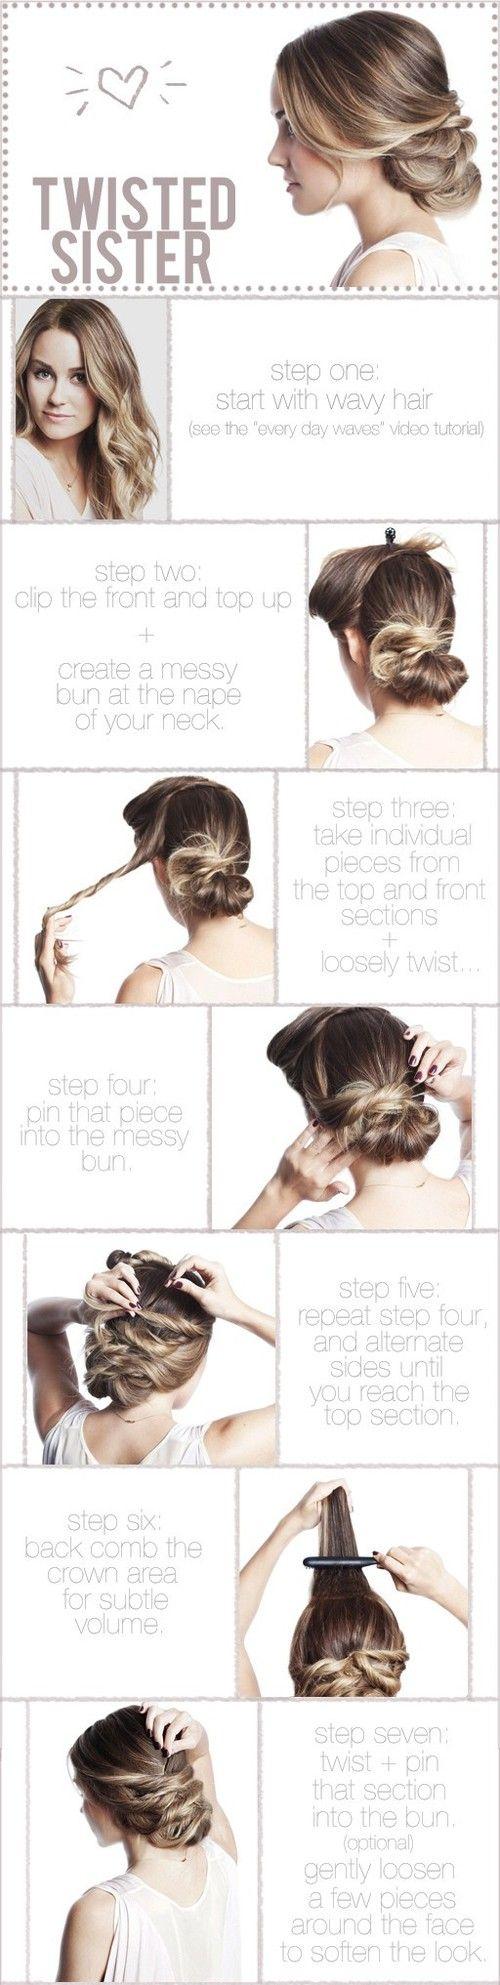 Grosgrain: Hair 16: Twisted Sister on we heart it / visual bookmark #10731662